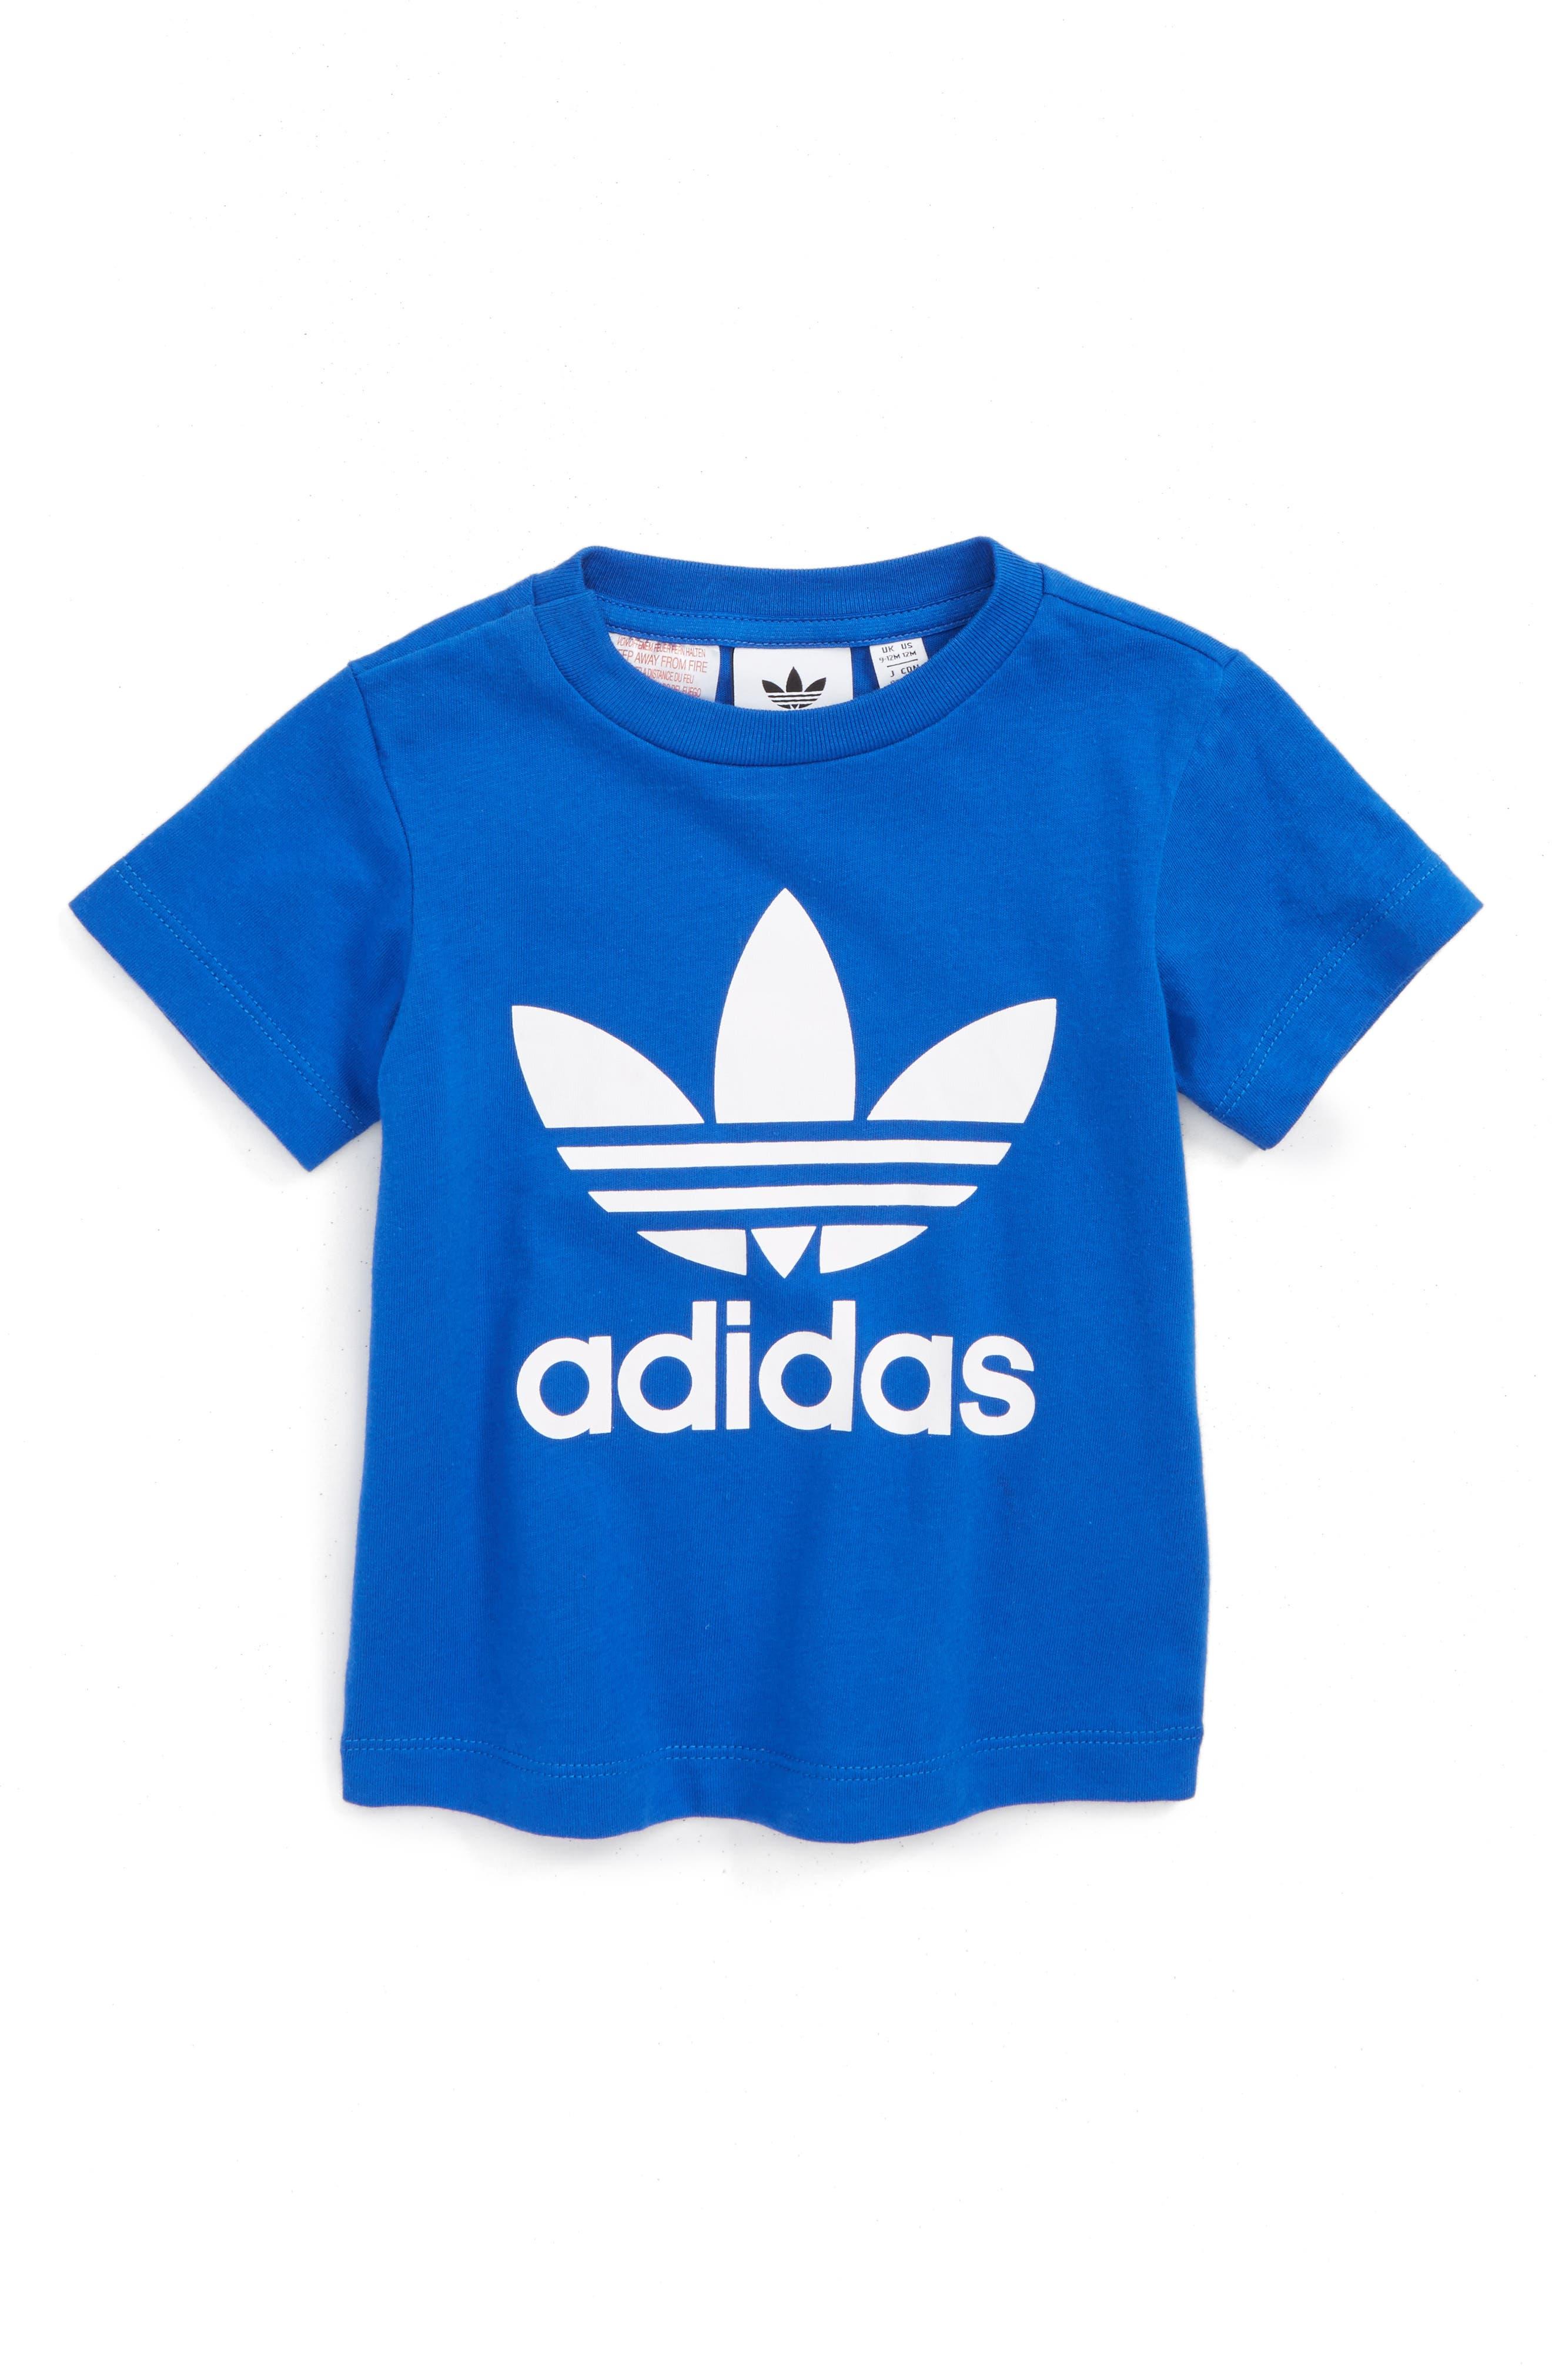 Originals Trefoil Logo T-Shirt,                             Main thumbnail 1, color,                             435